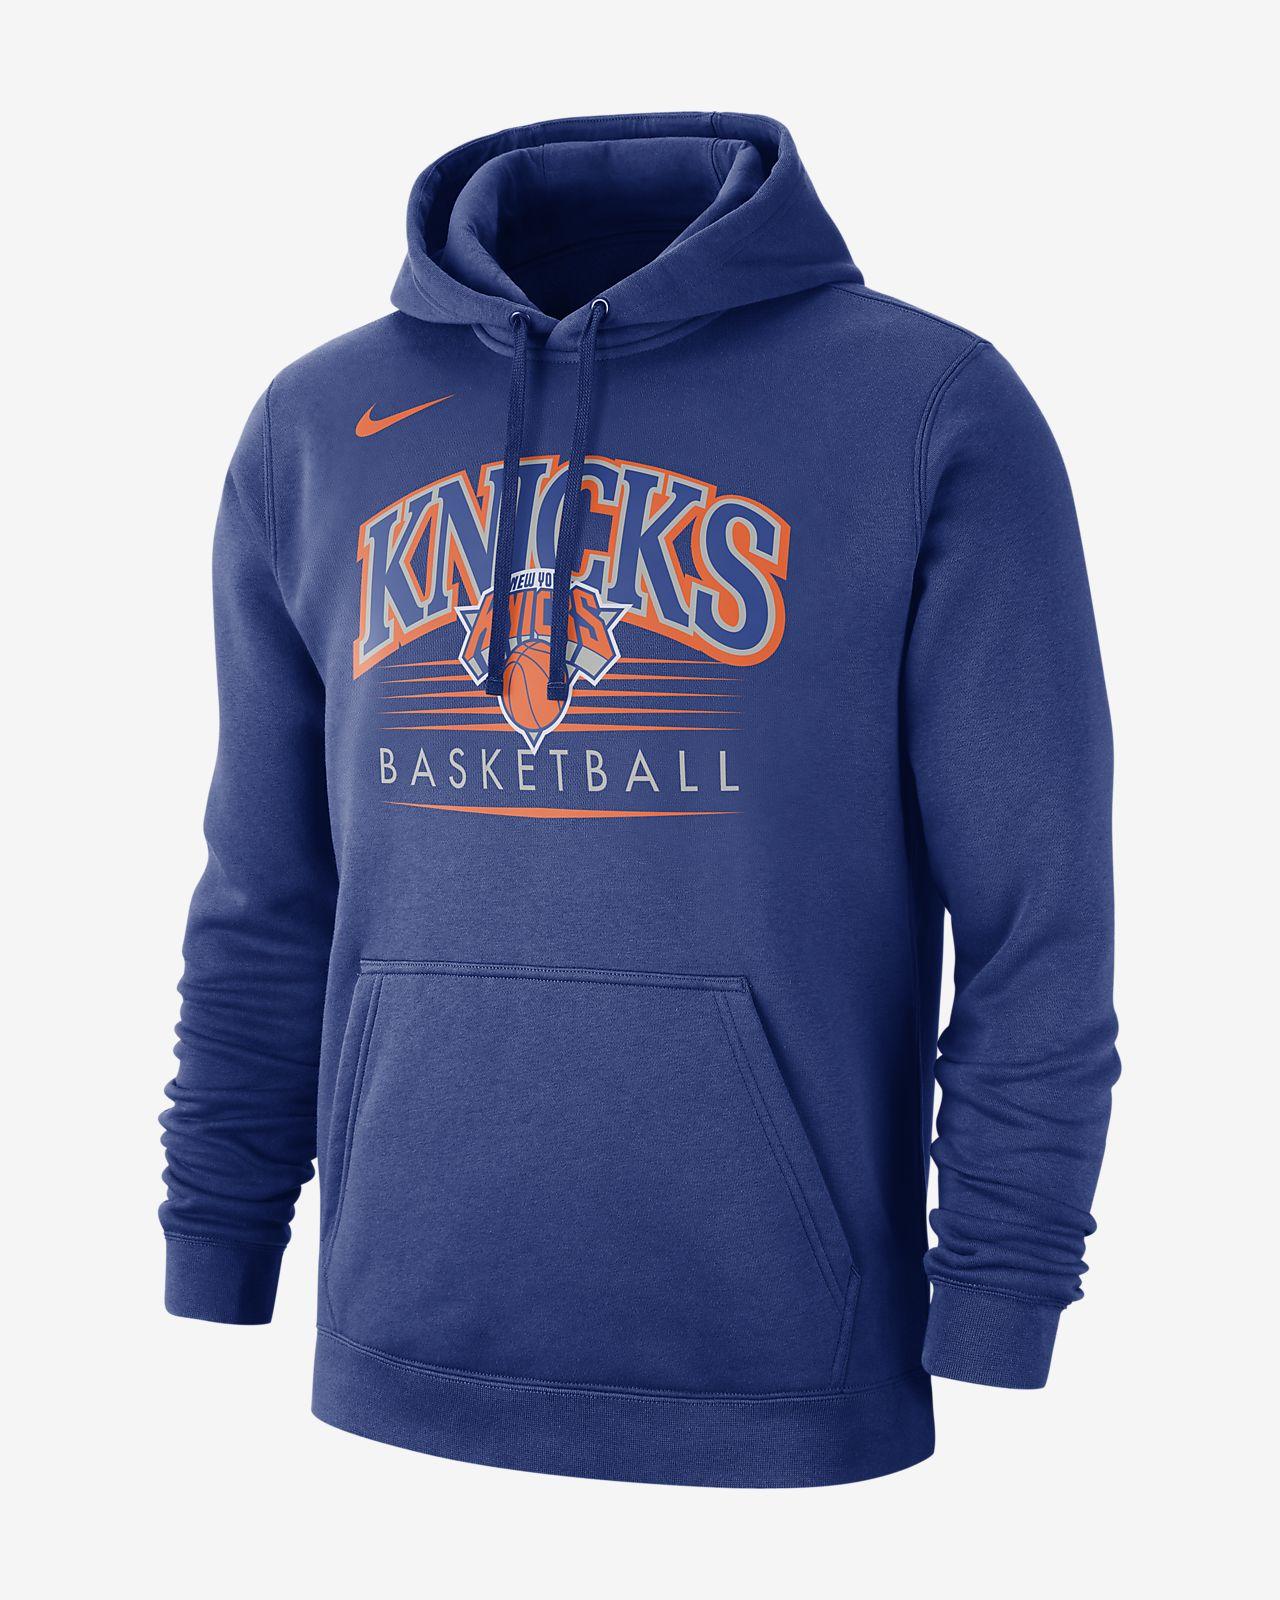 New Nike Knicks Sweat HommeFr À York Nba Capuche Pour kiPZXu